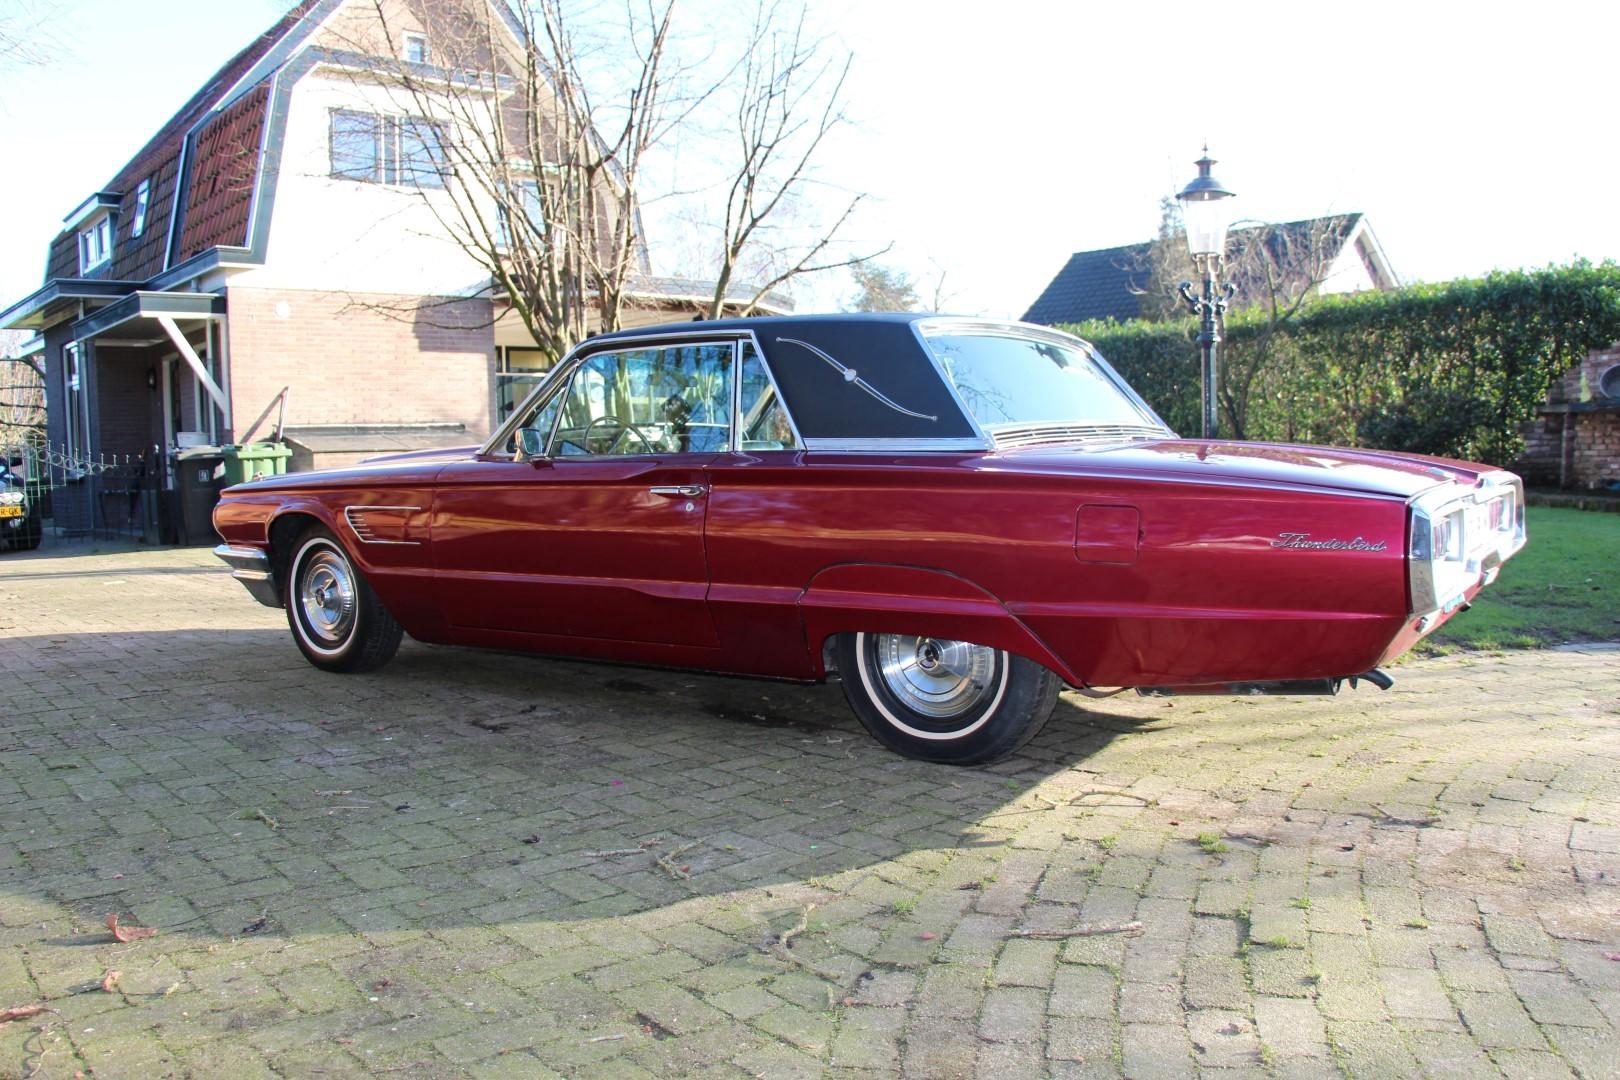 1965 Ford Thunderbird Hardtop - Burgundy (10)